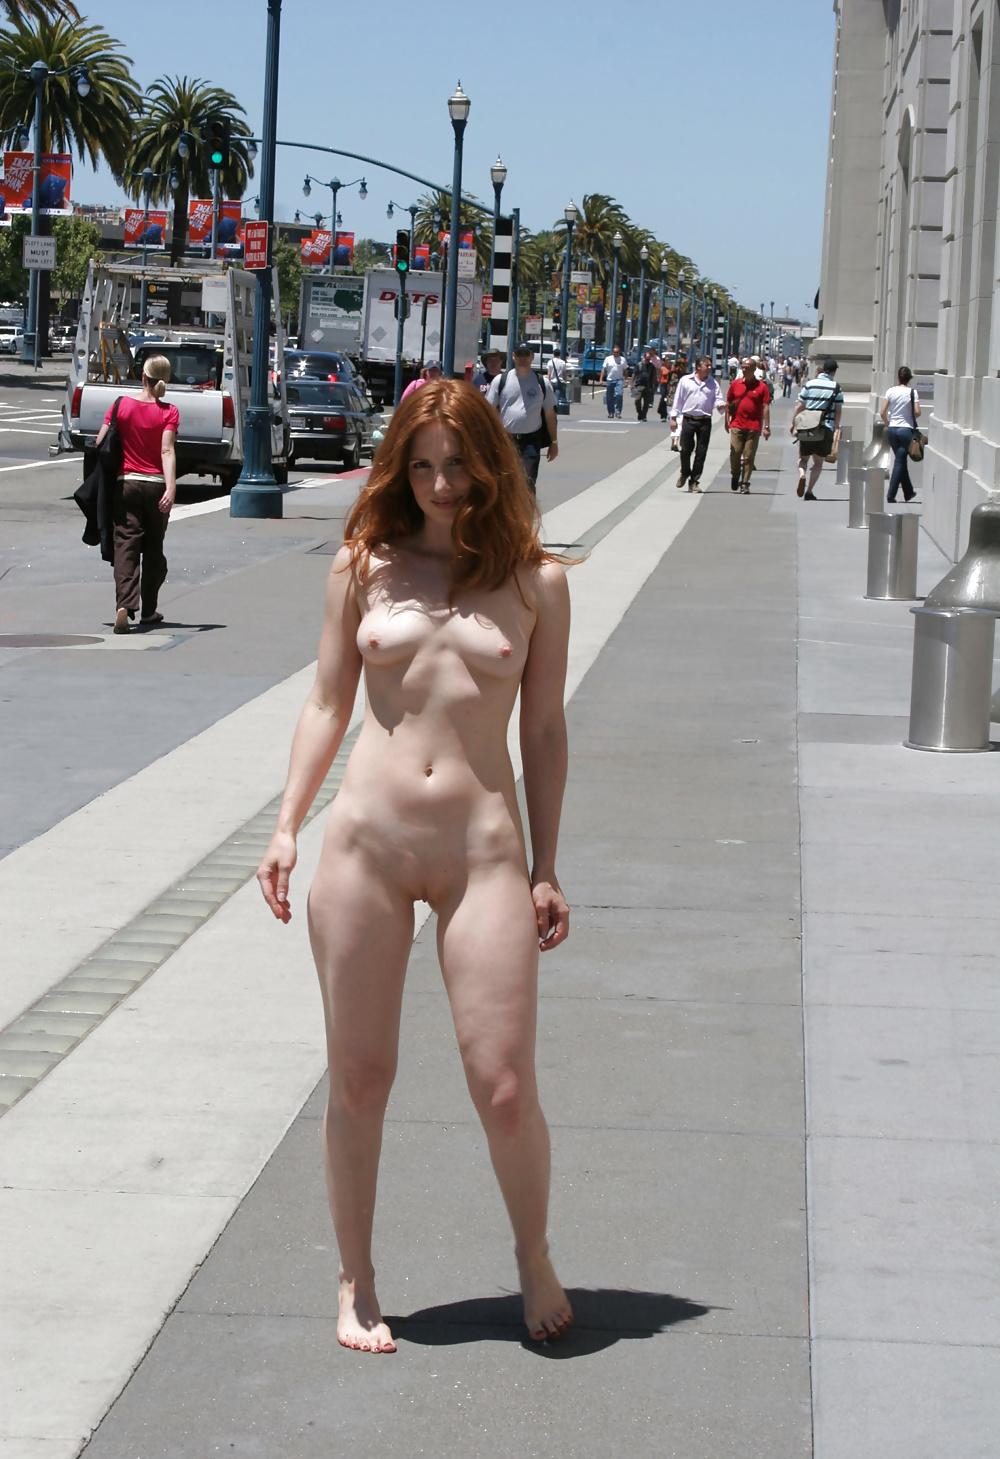 exhibitionist-nudes